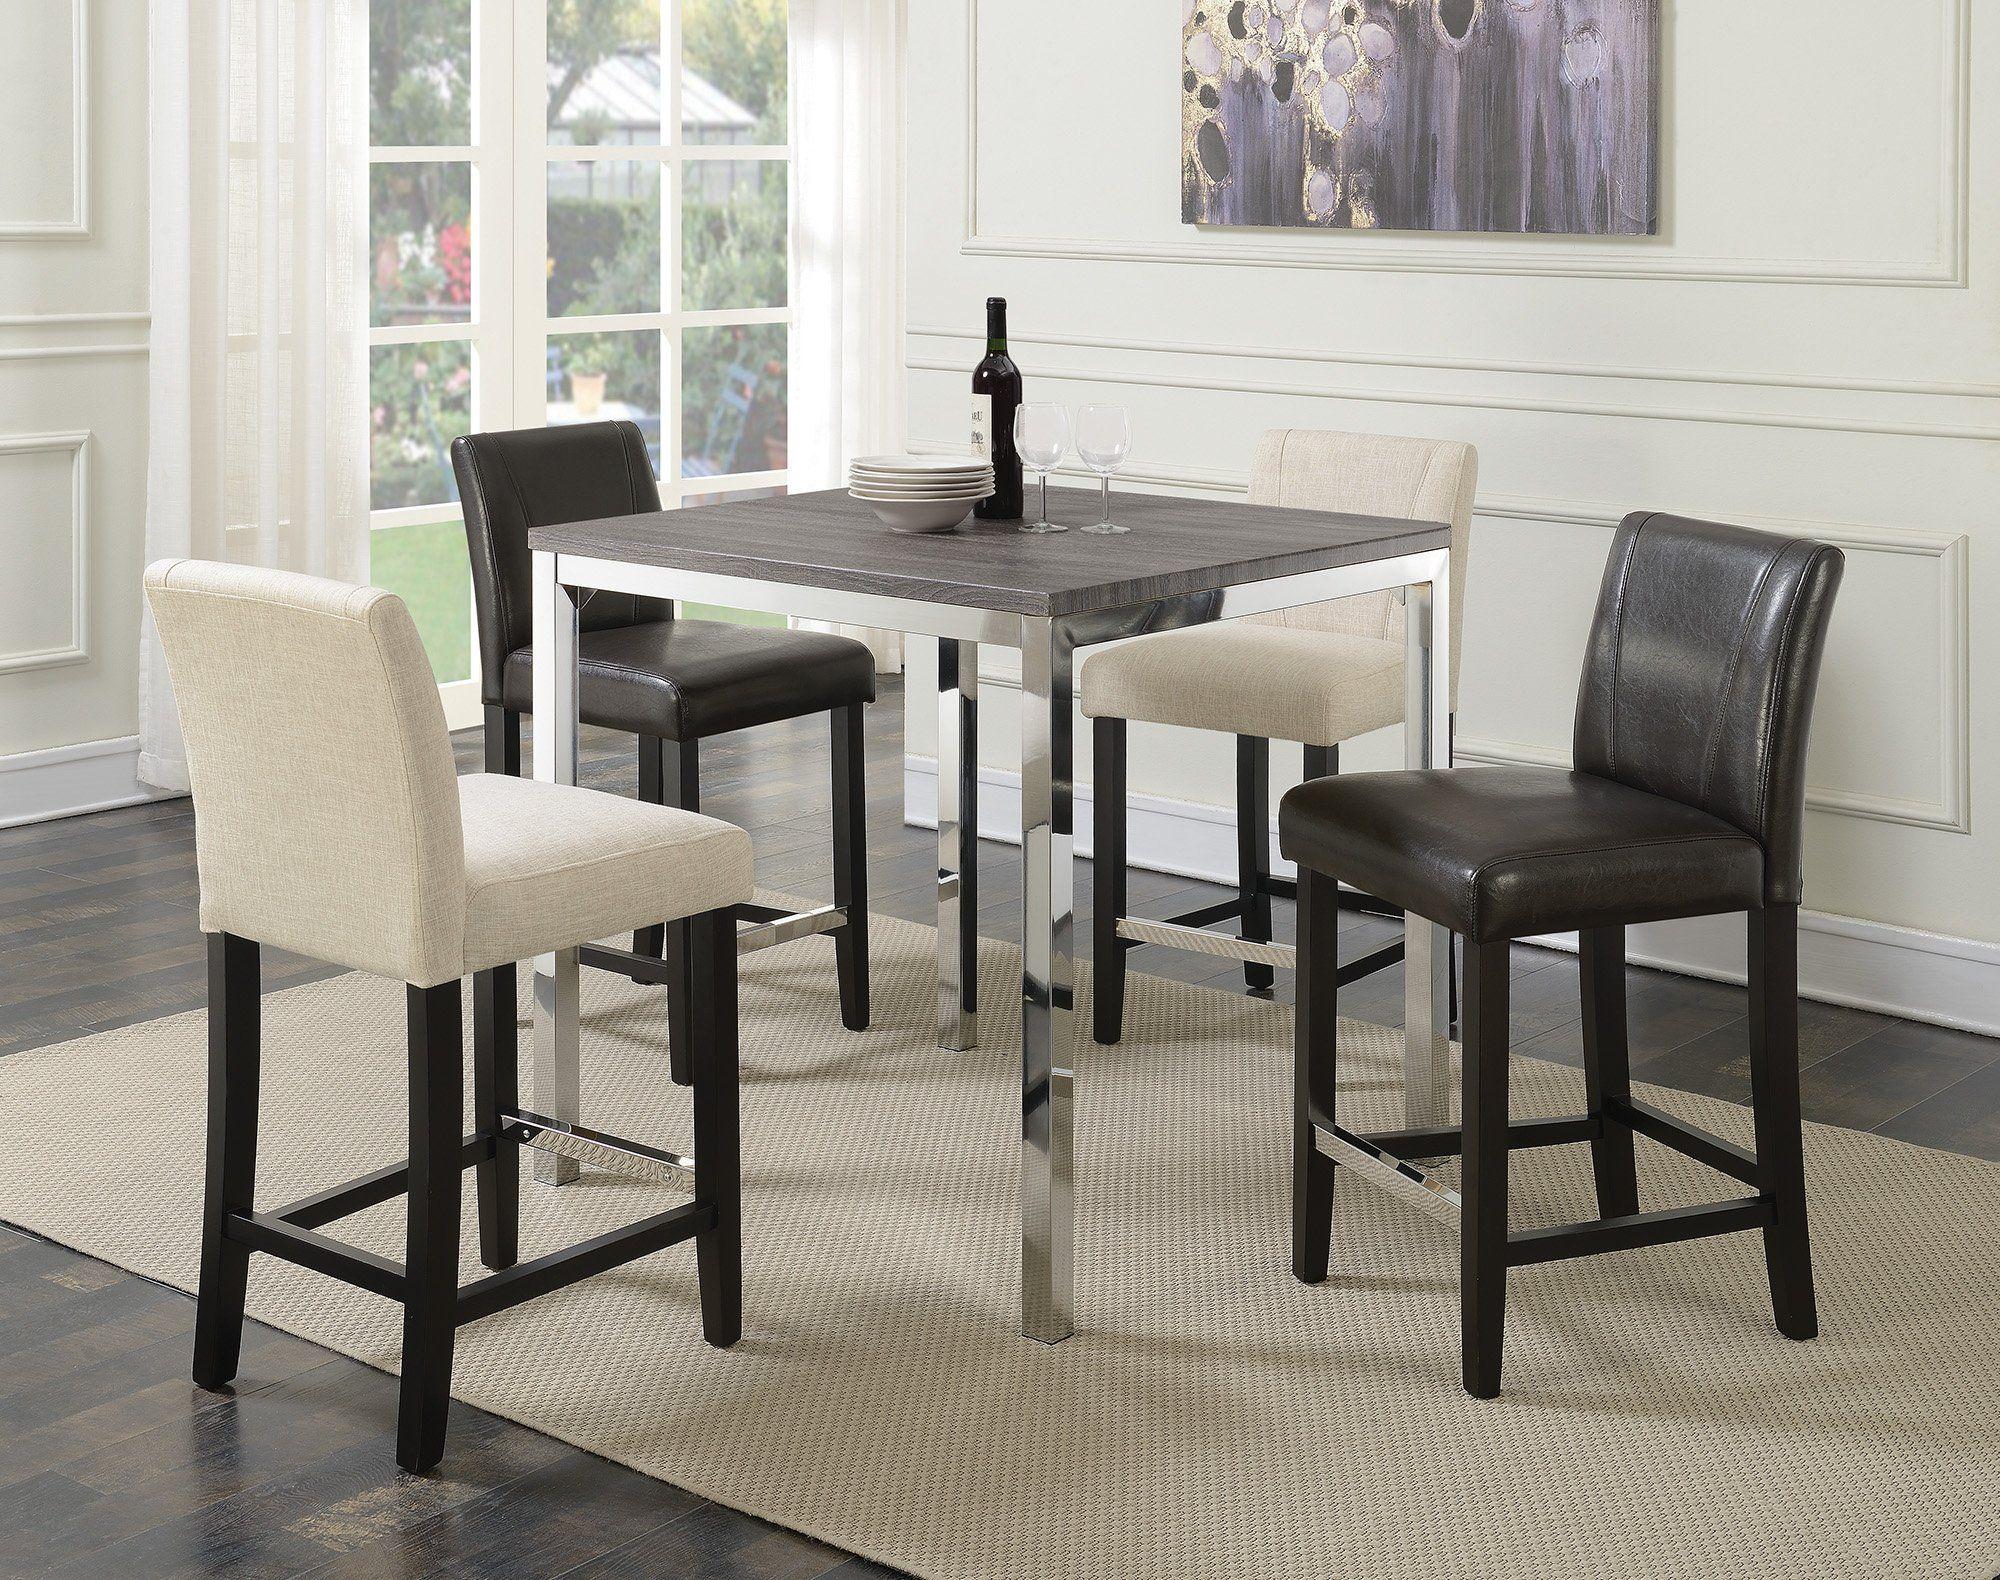 Coaster Eldridge Weathered Grey Chrome 5 Piece Dining Table Set